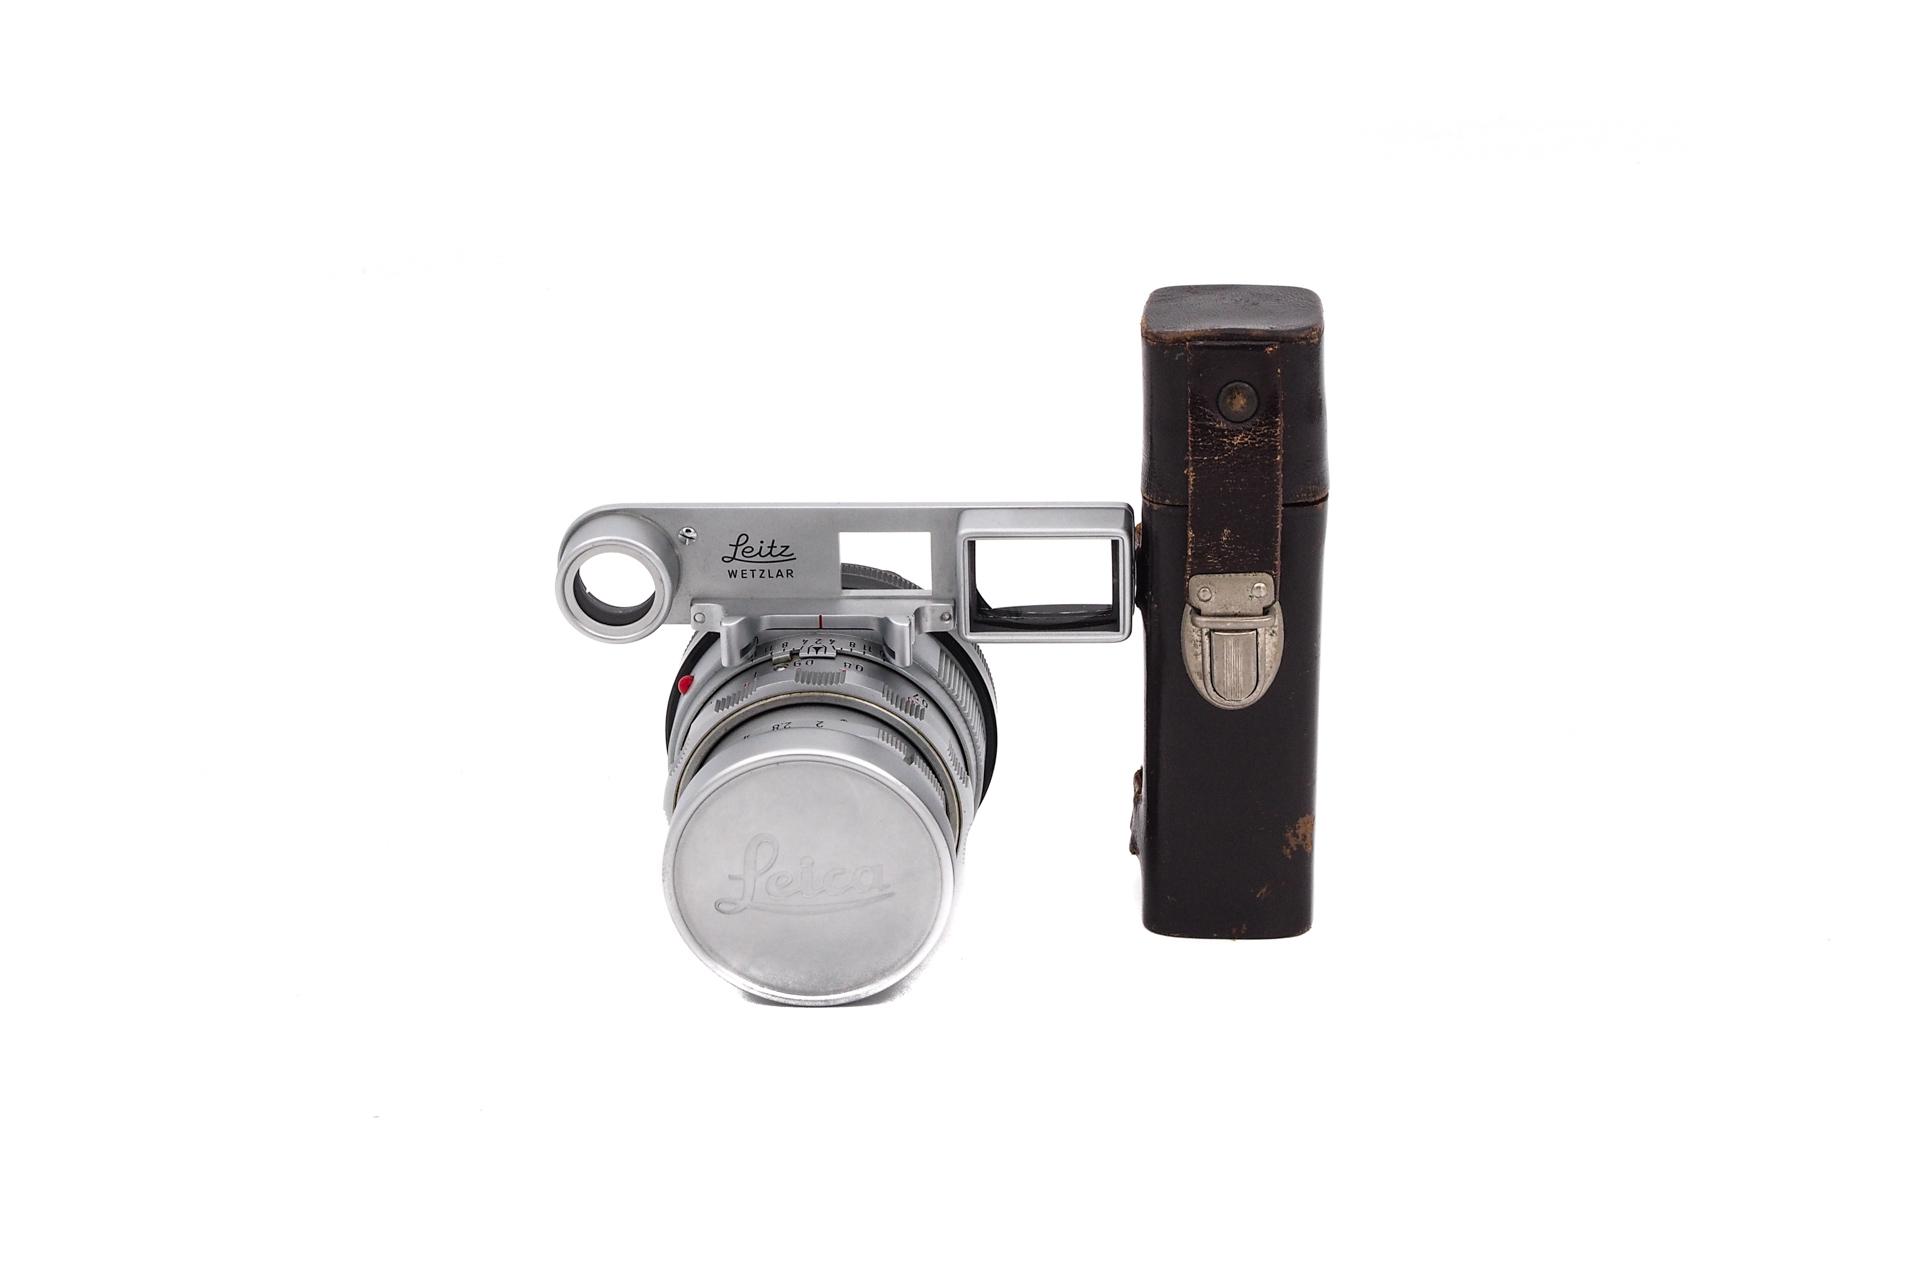 Leica Summicron 50mm F/2 Dual-Range